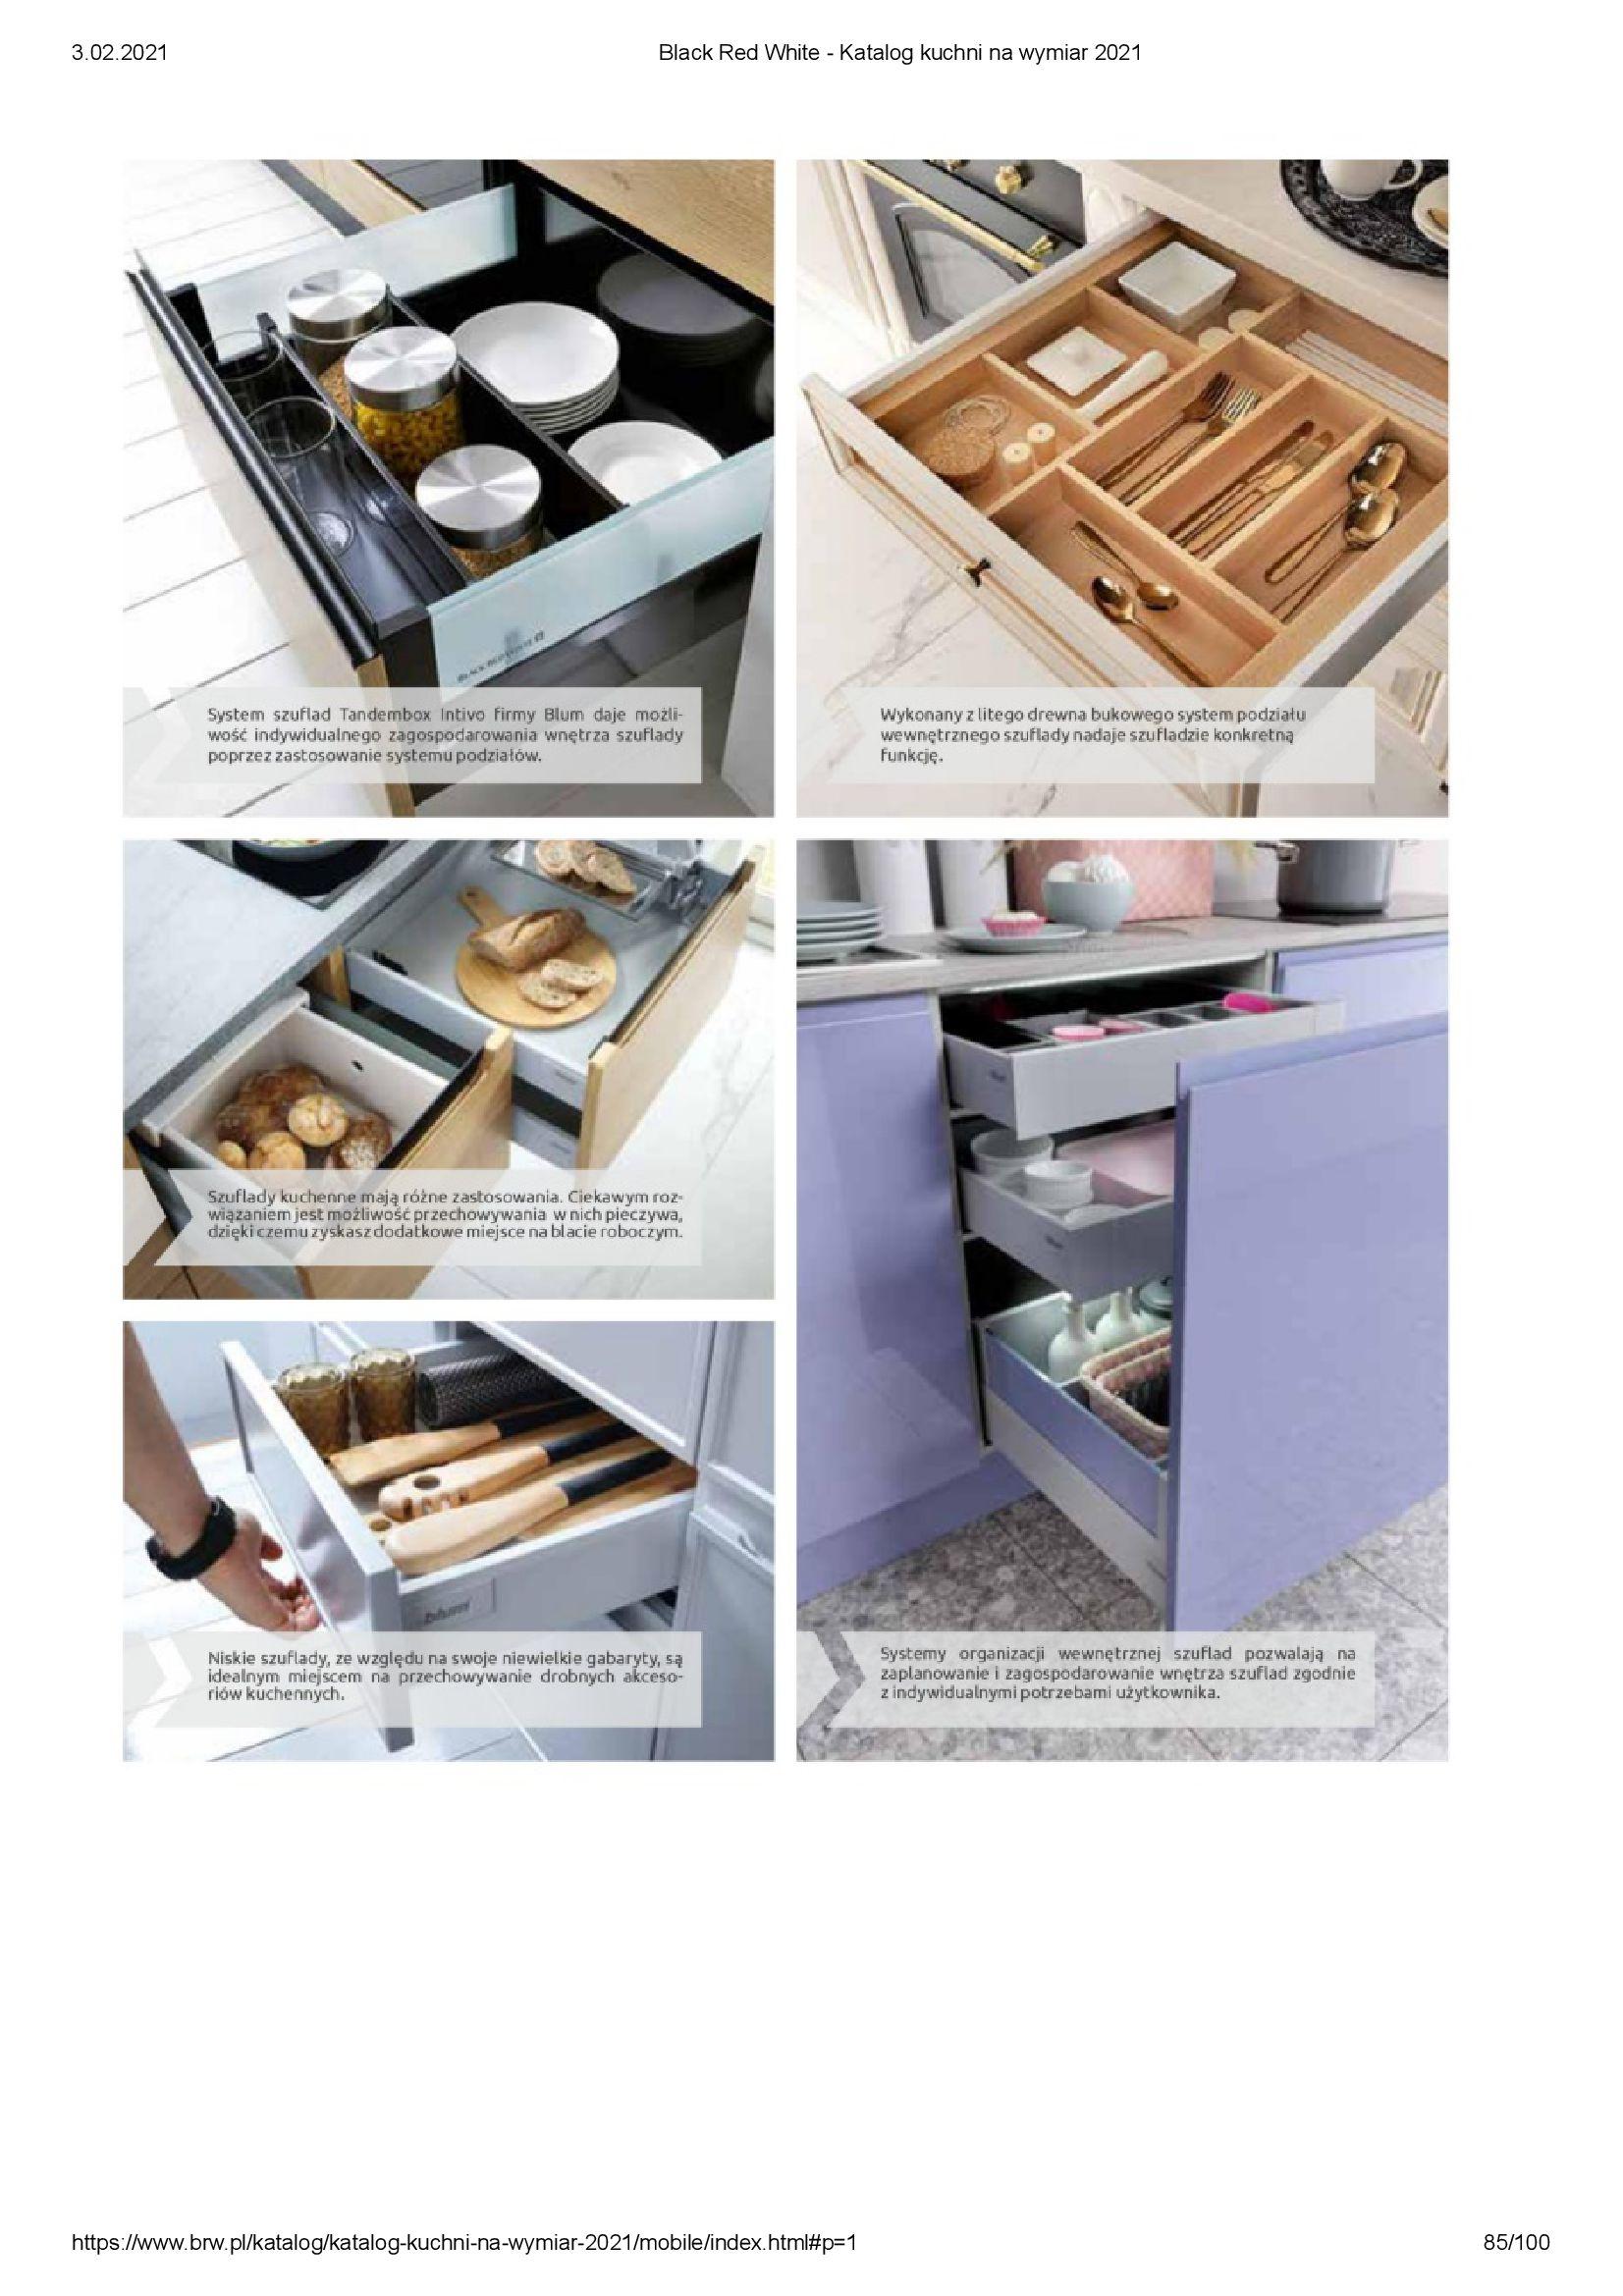 Gazetka Black Red White: Katalog - Kuchnie na wymiar Senso Kitchens 2021 2021-01-01 page-85